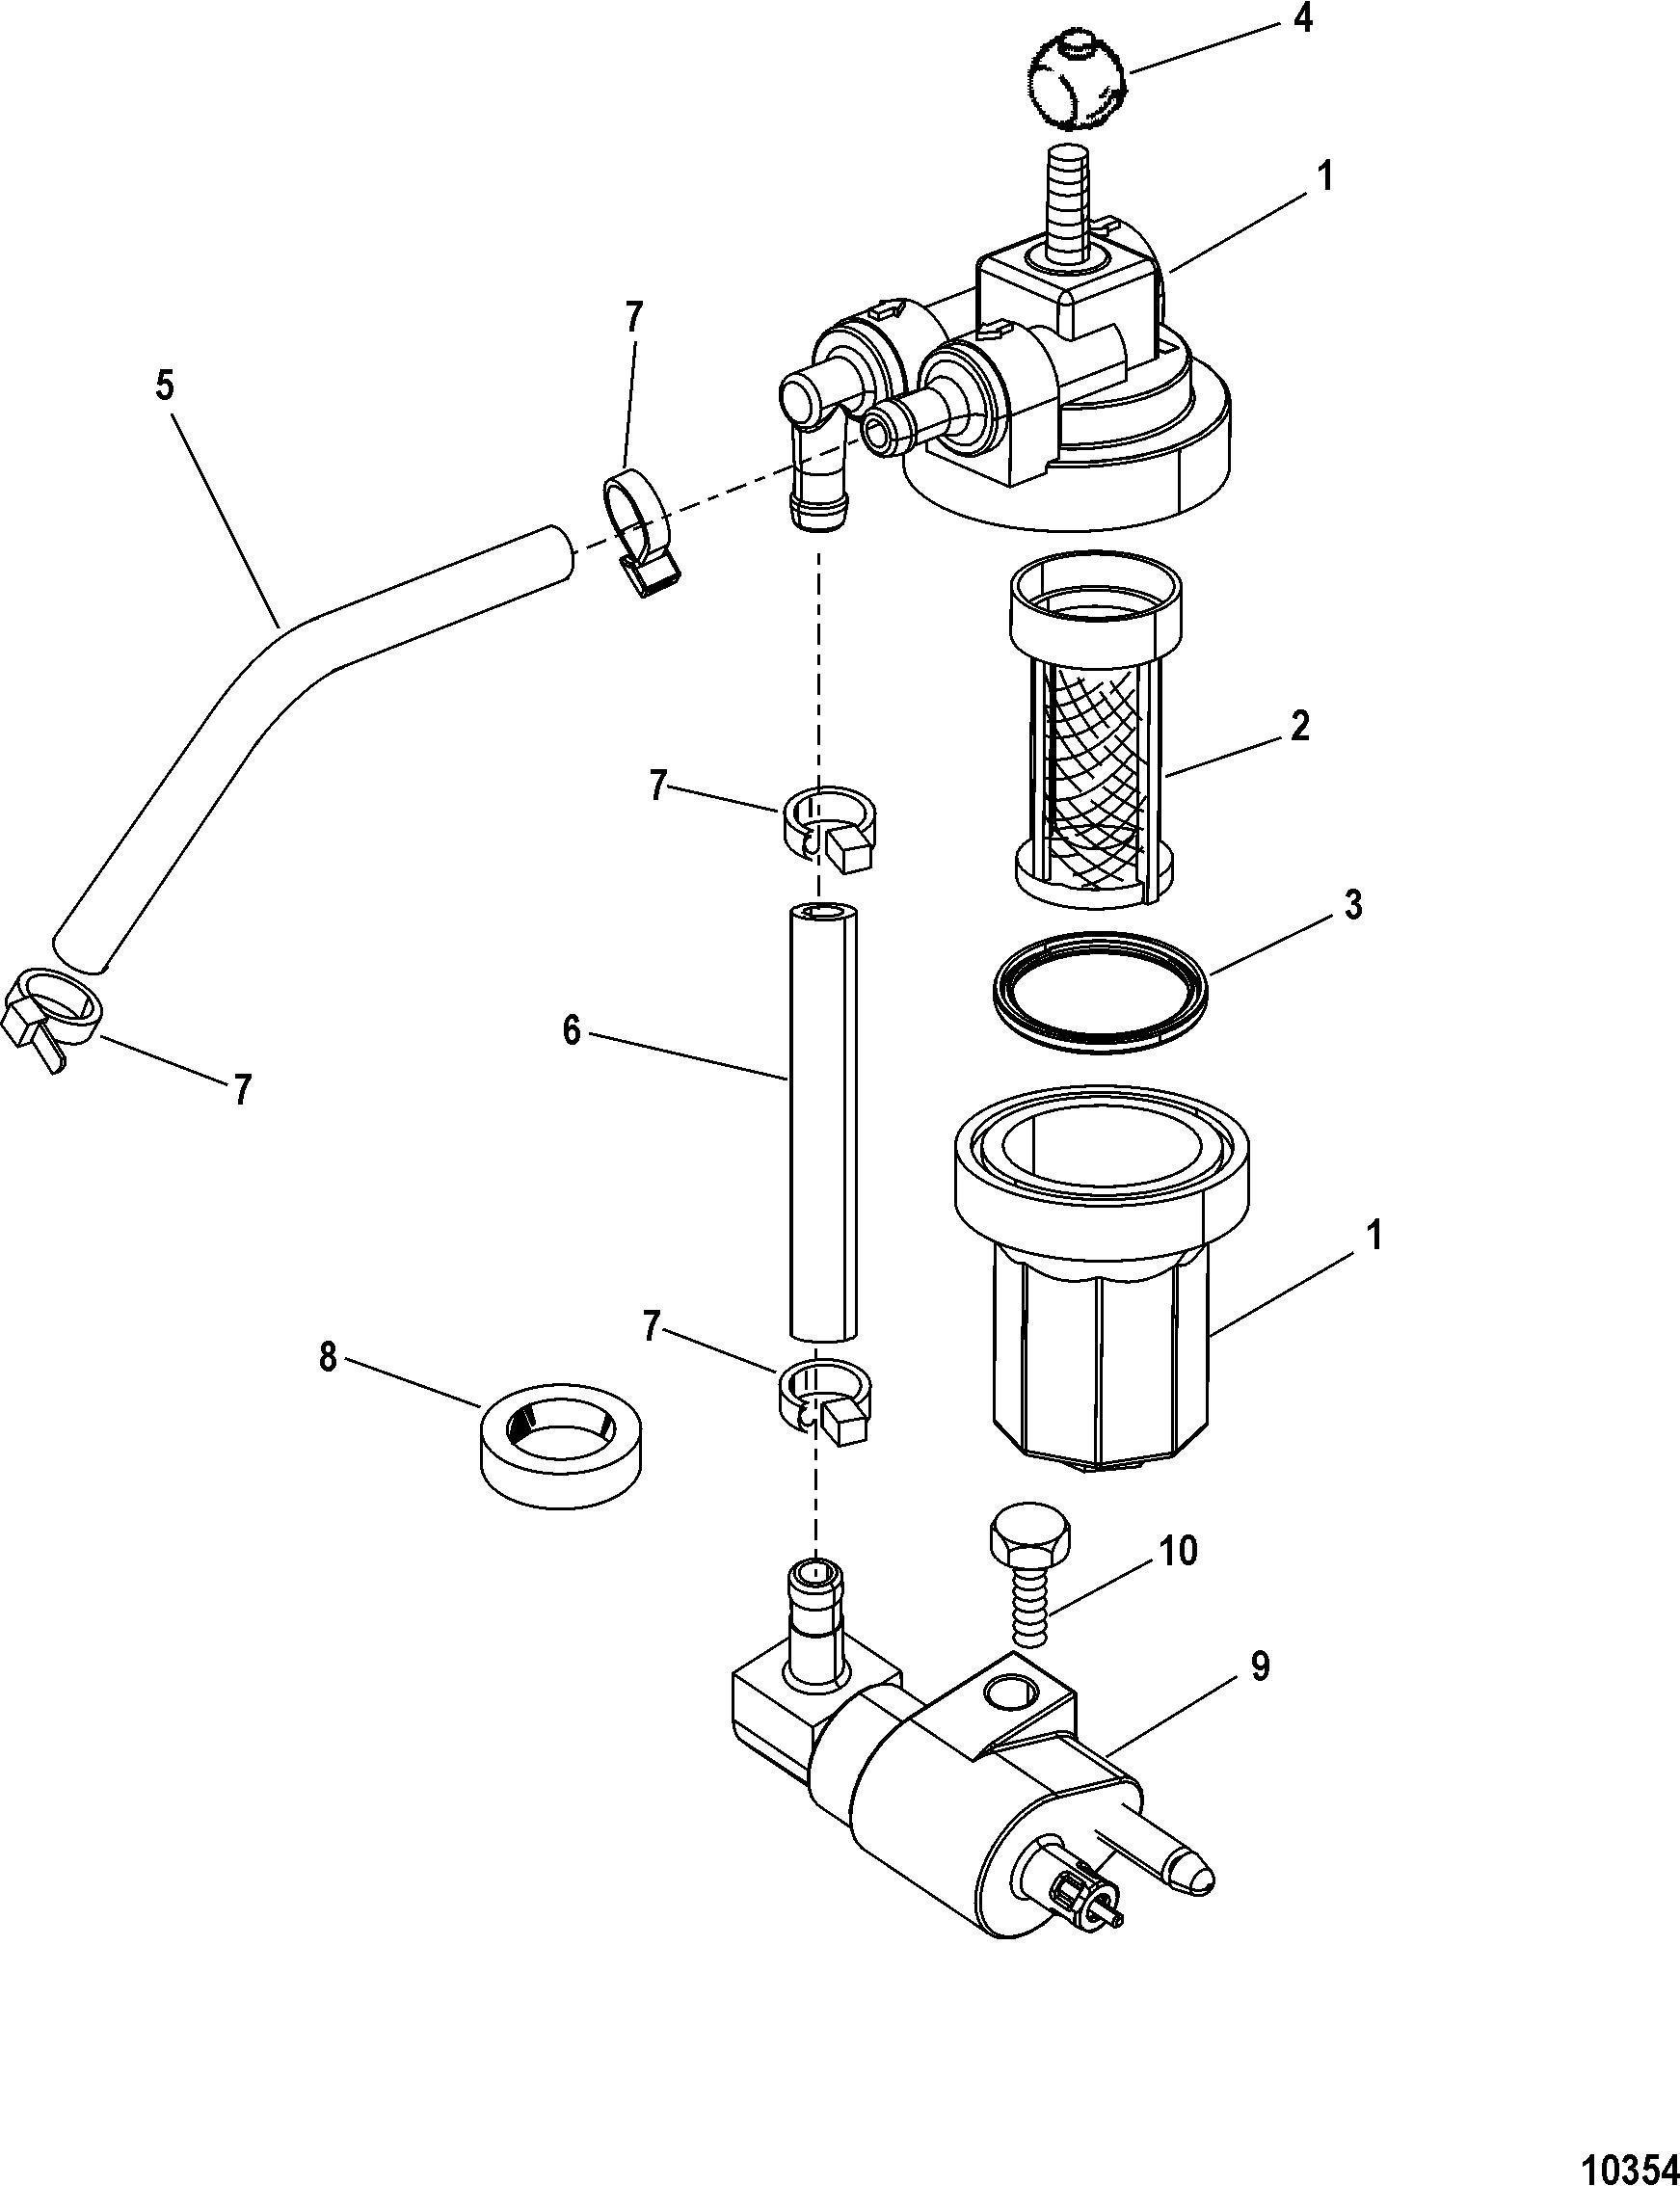 fuel filter assembly usa bel